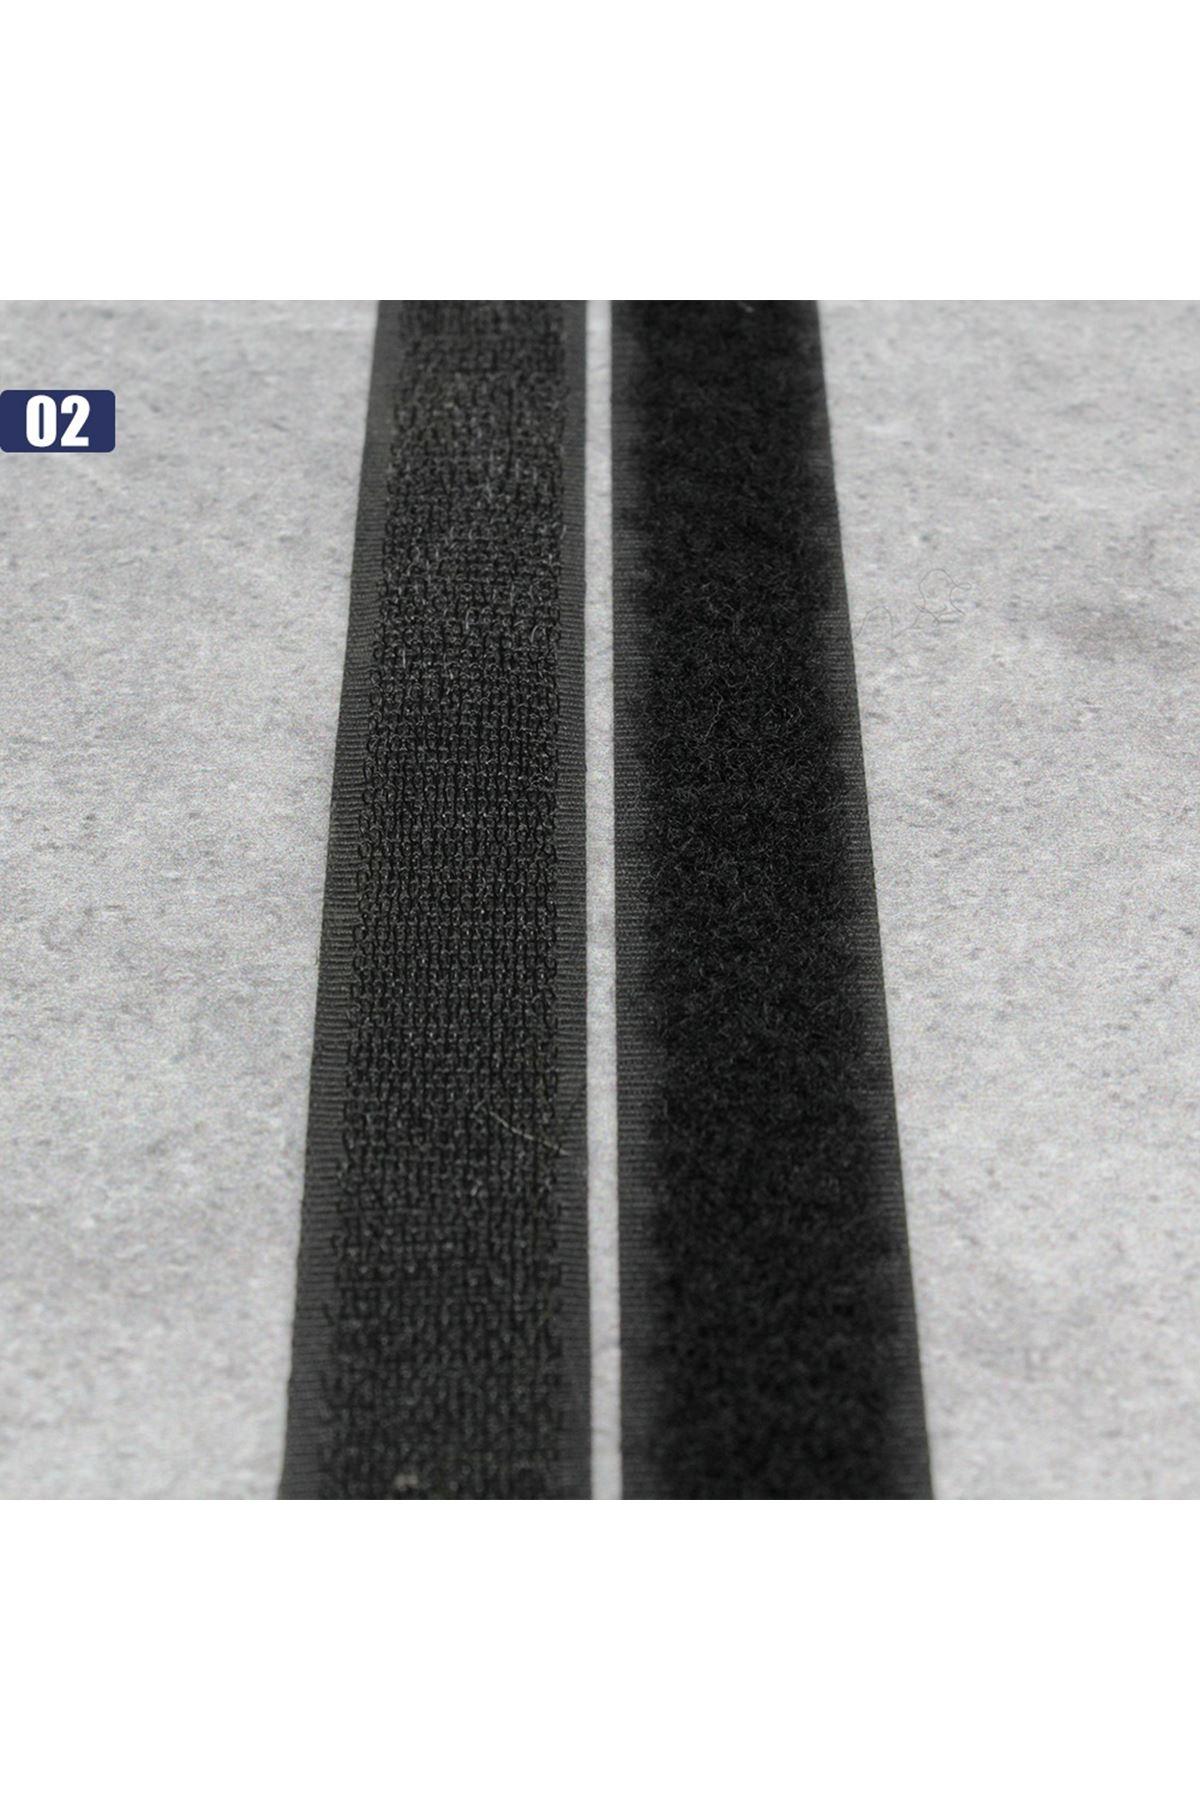 1 Metre Cırt Bant 02